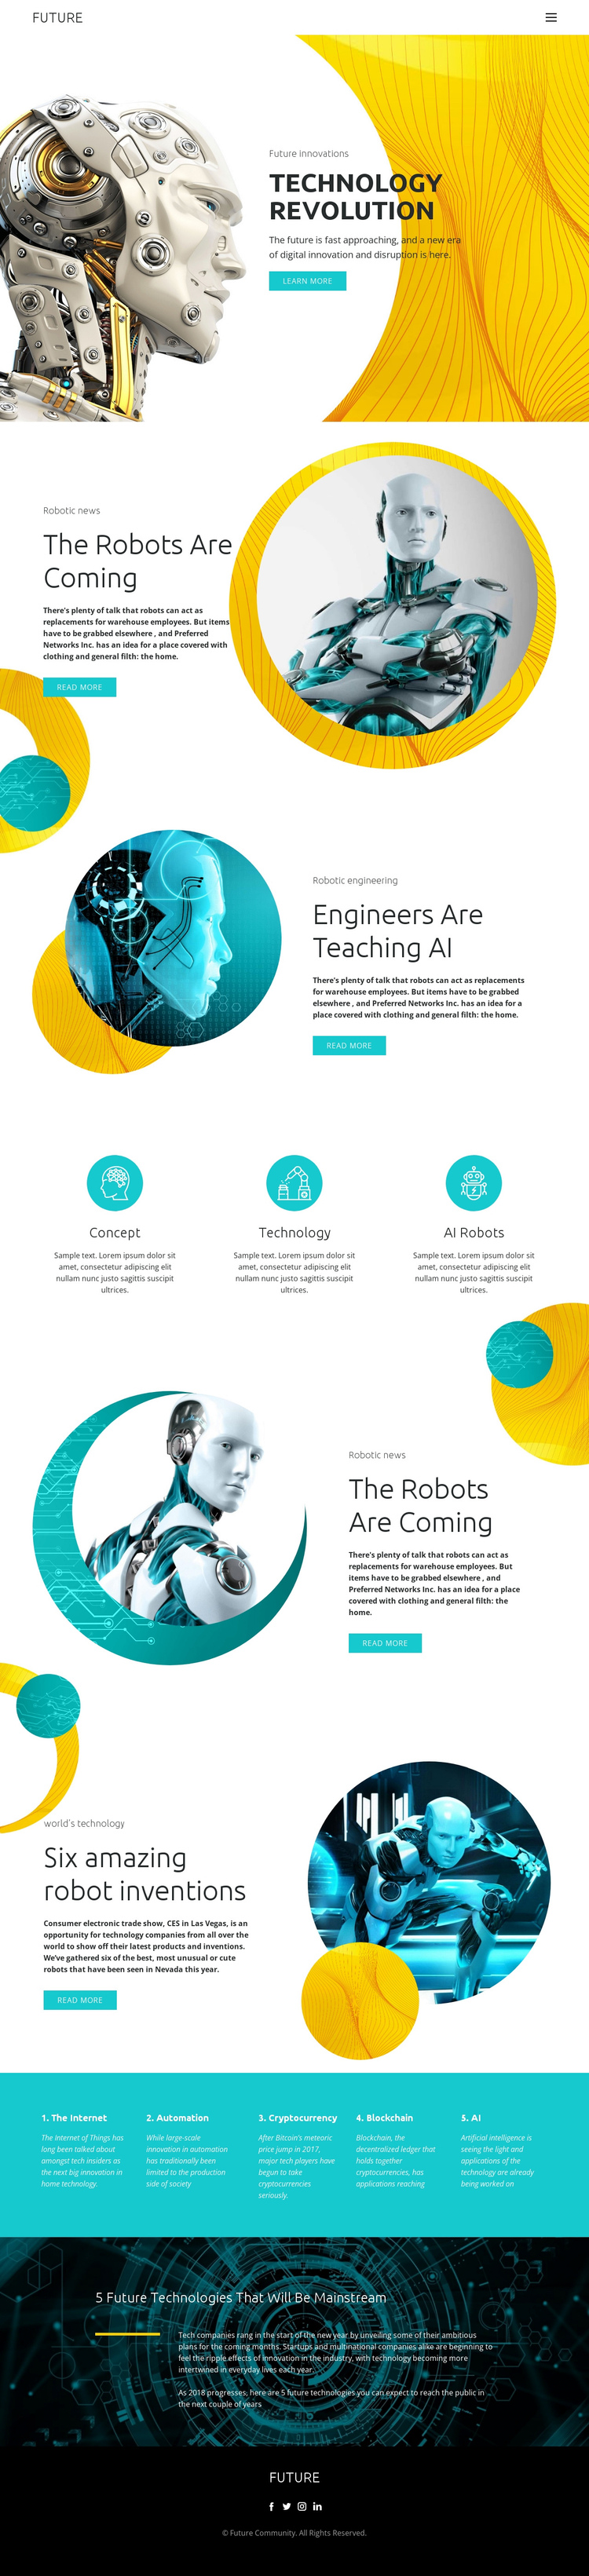 Progress in robot technology  Website Builder Software